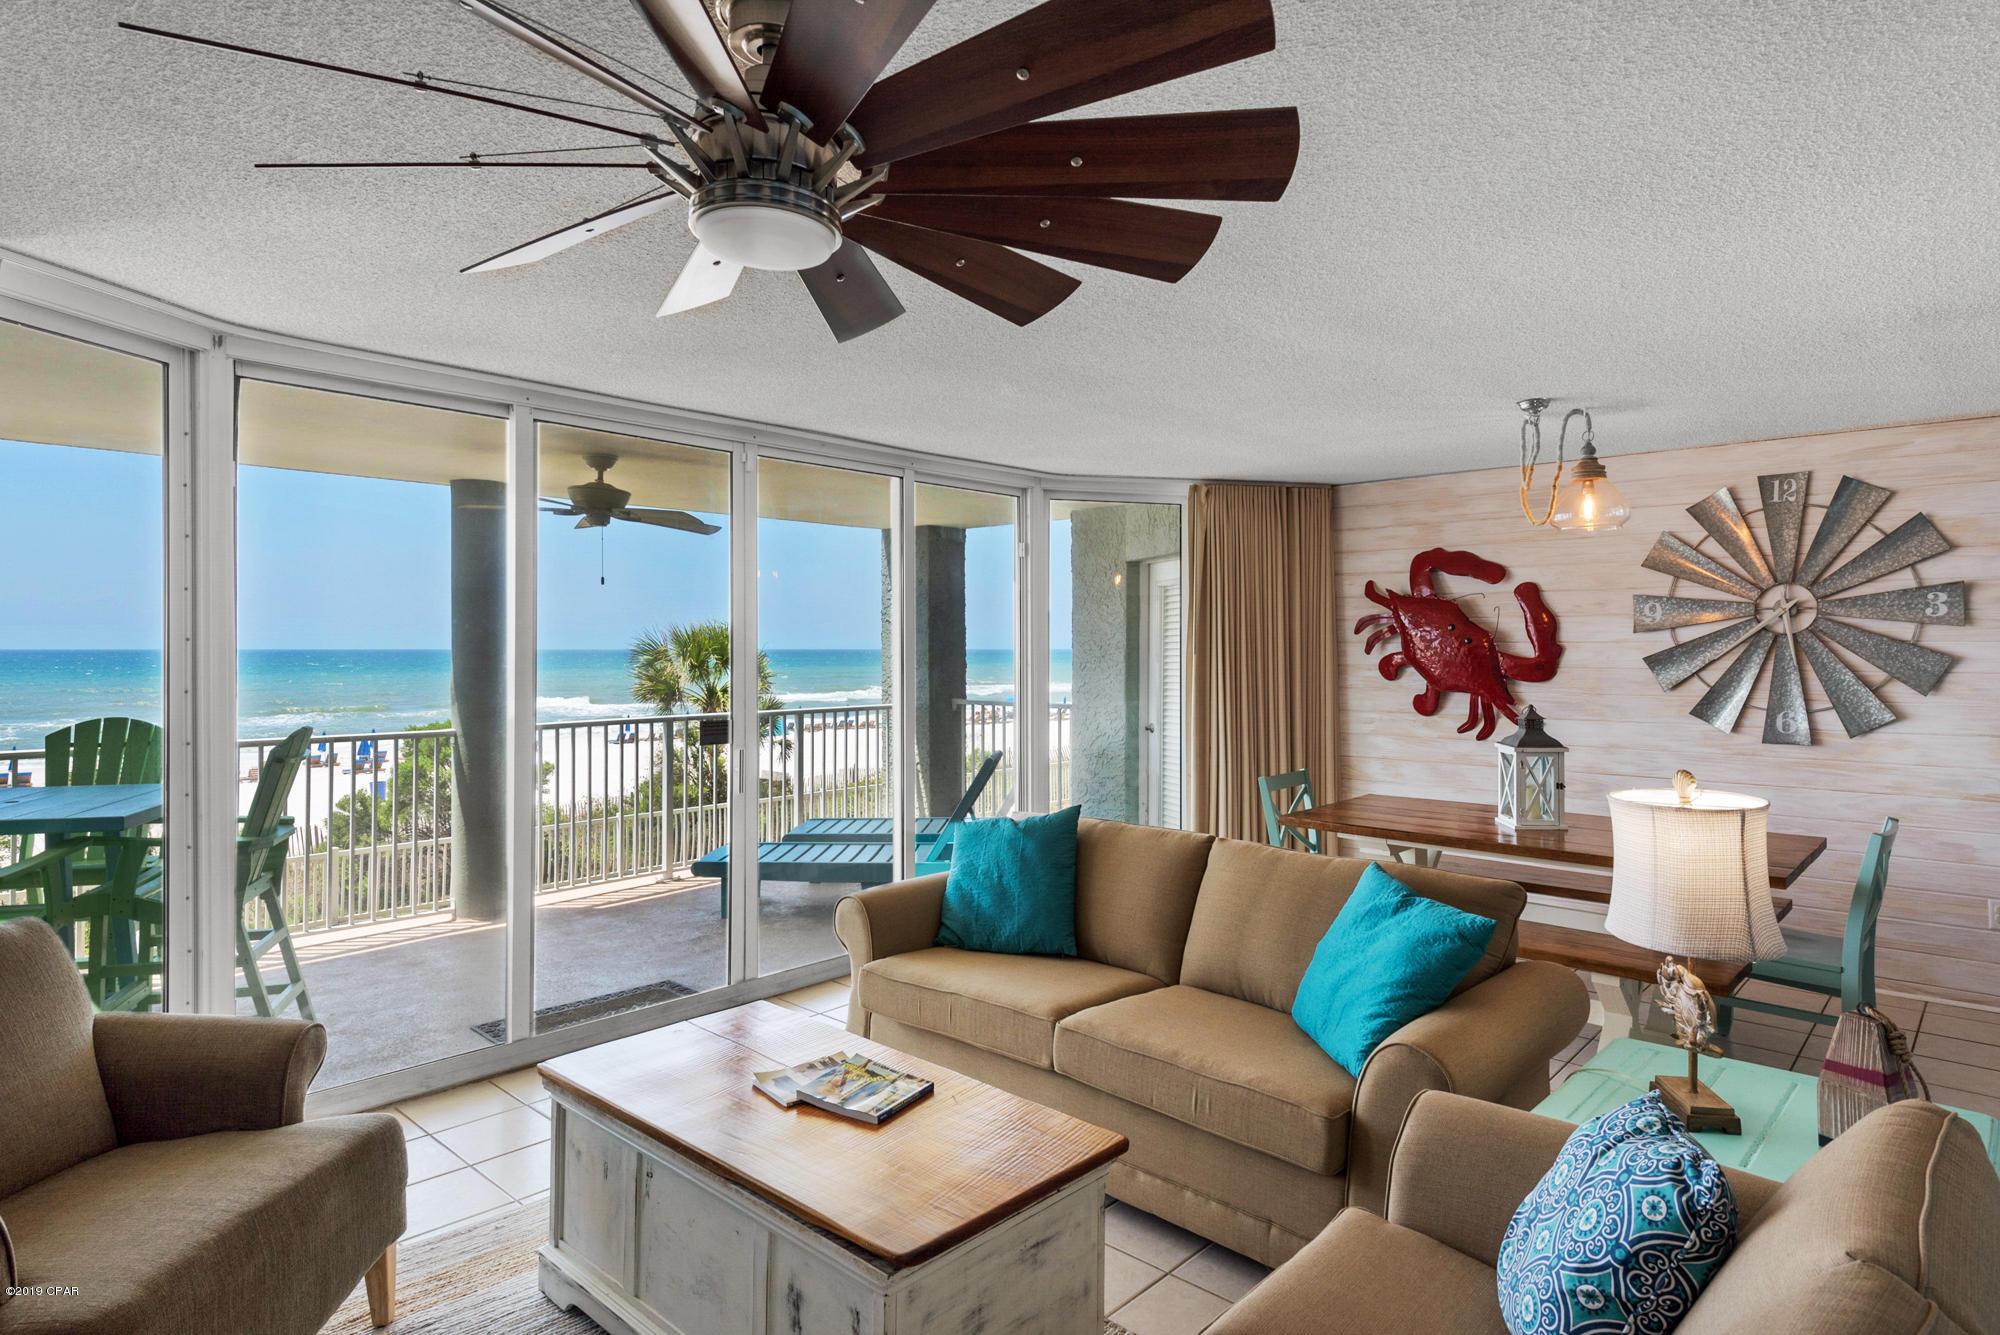 A 2 Bedroom 2 Bedroom Long Beach Towers Iv Condominium